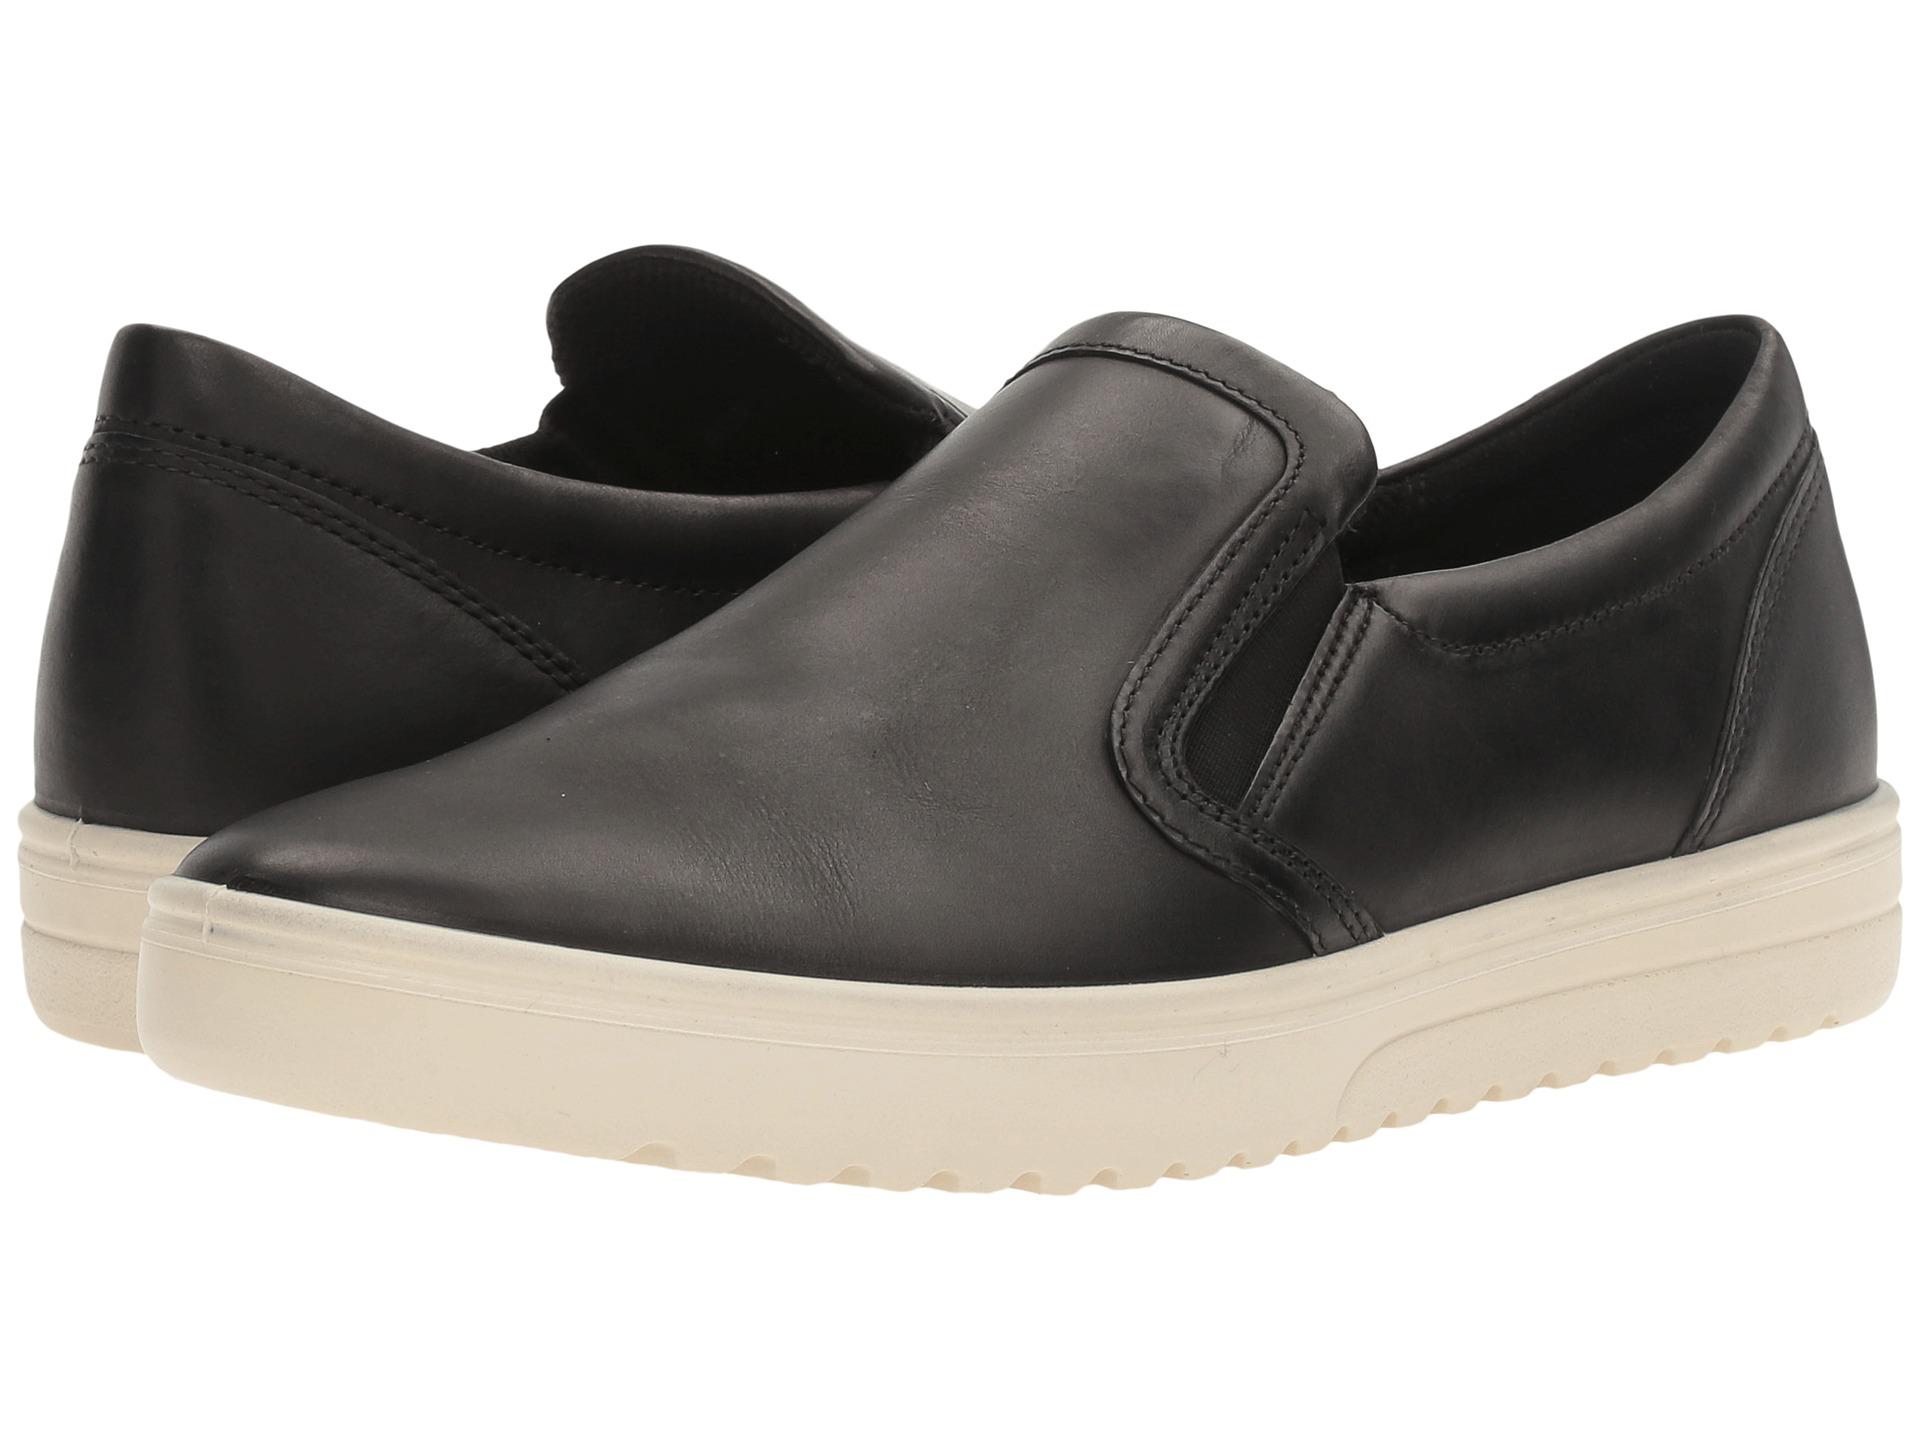 View More Like This ECCO Fara Slip On Sneaker